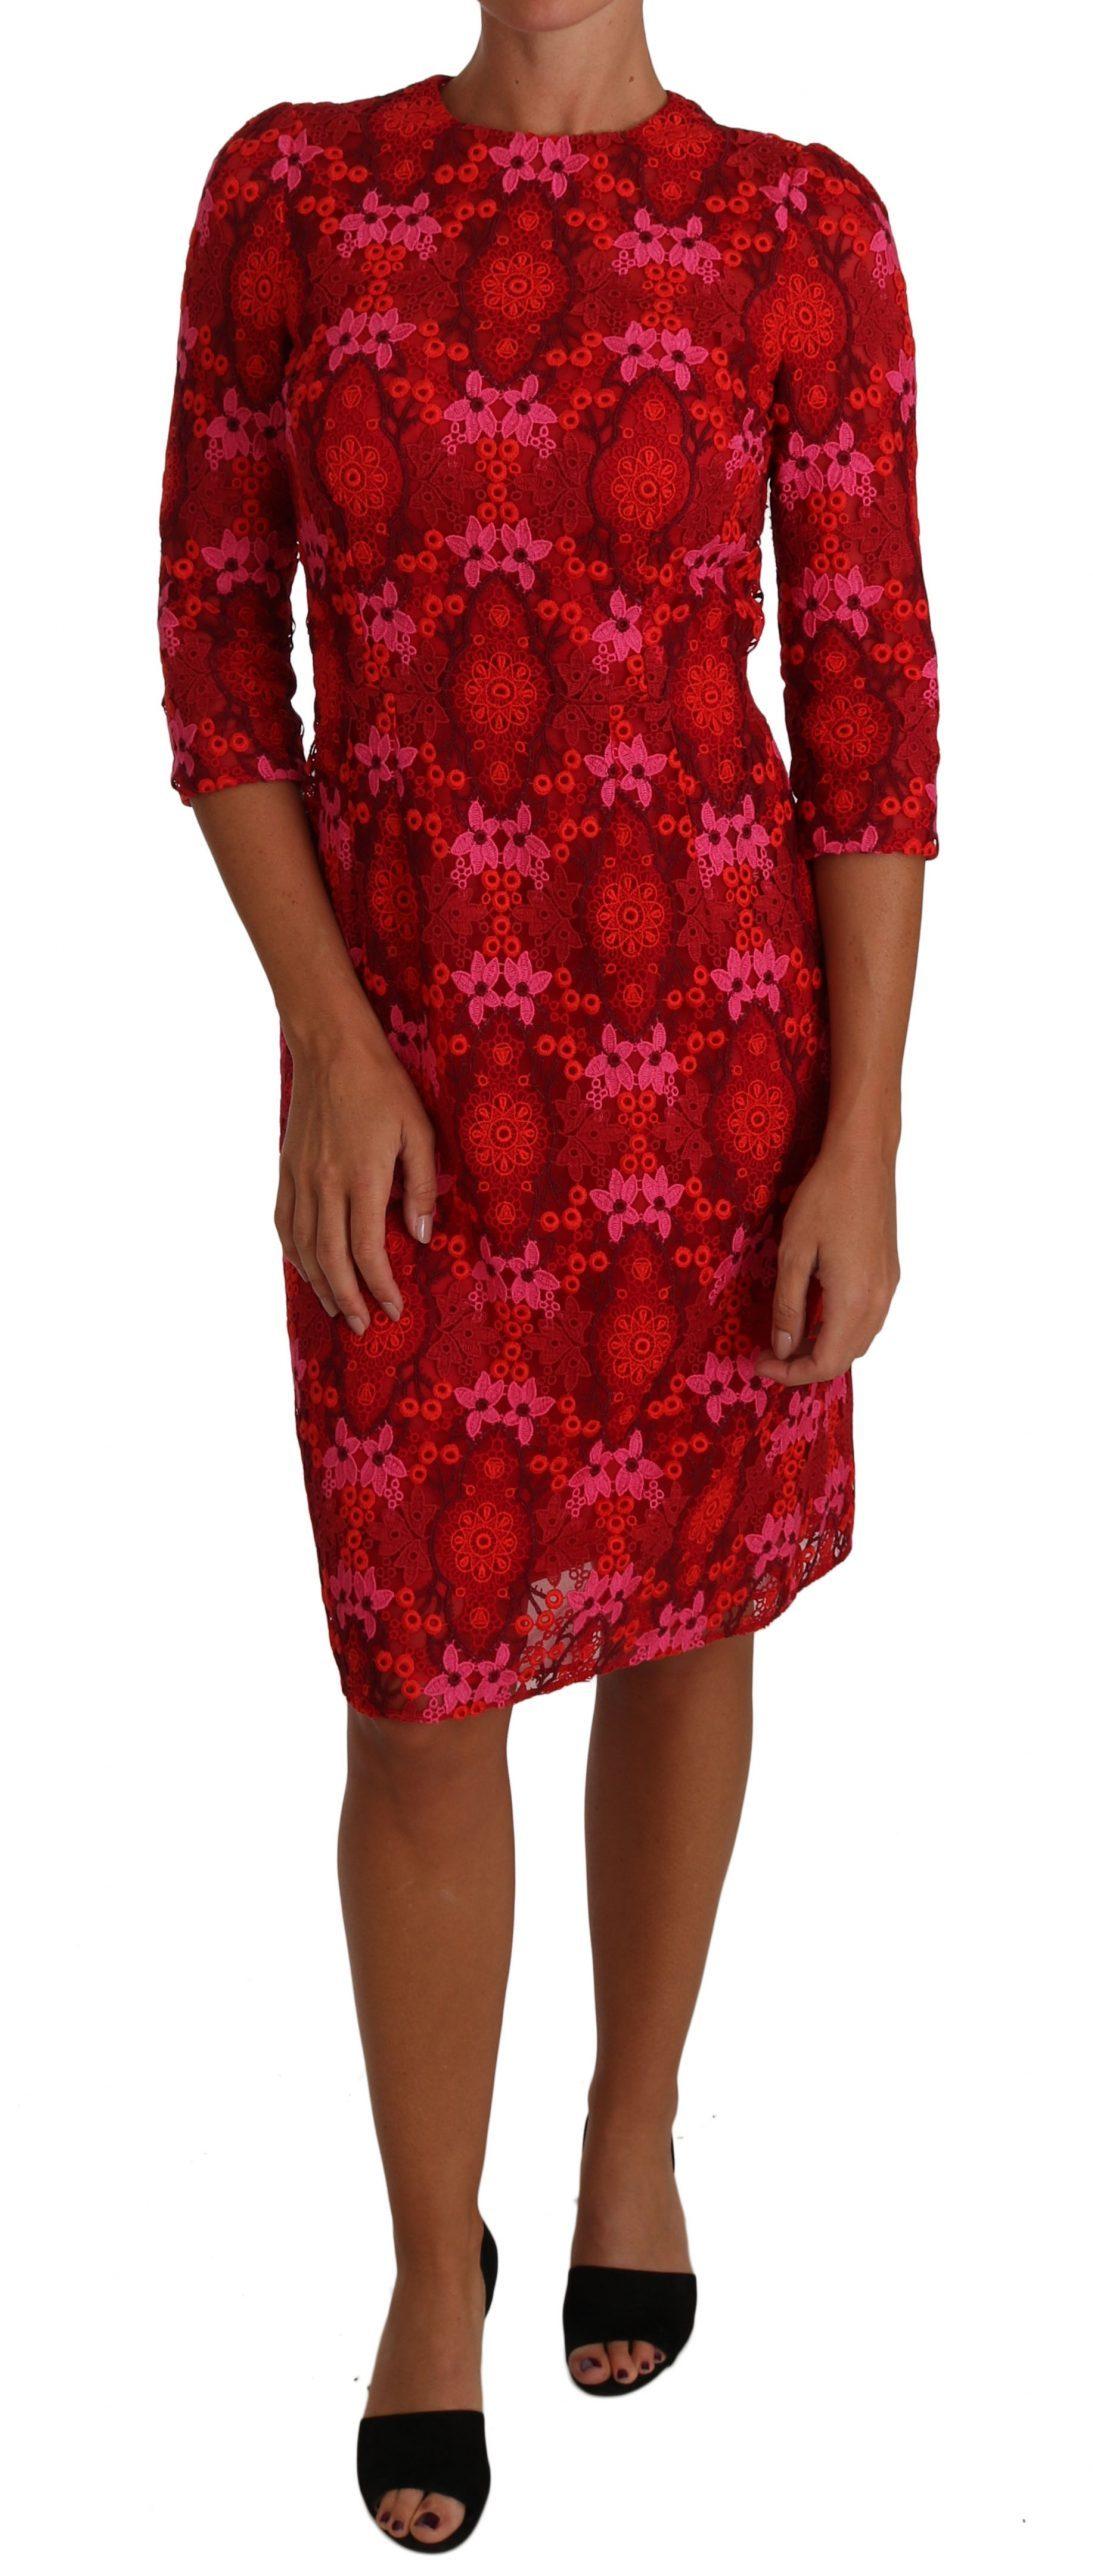 Dolce & Gabbana Women's Floral Crochet Lace Sheath Dress Pink DR1458 - IT40 S